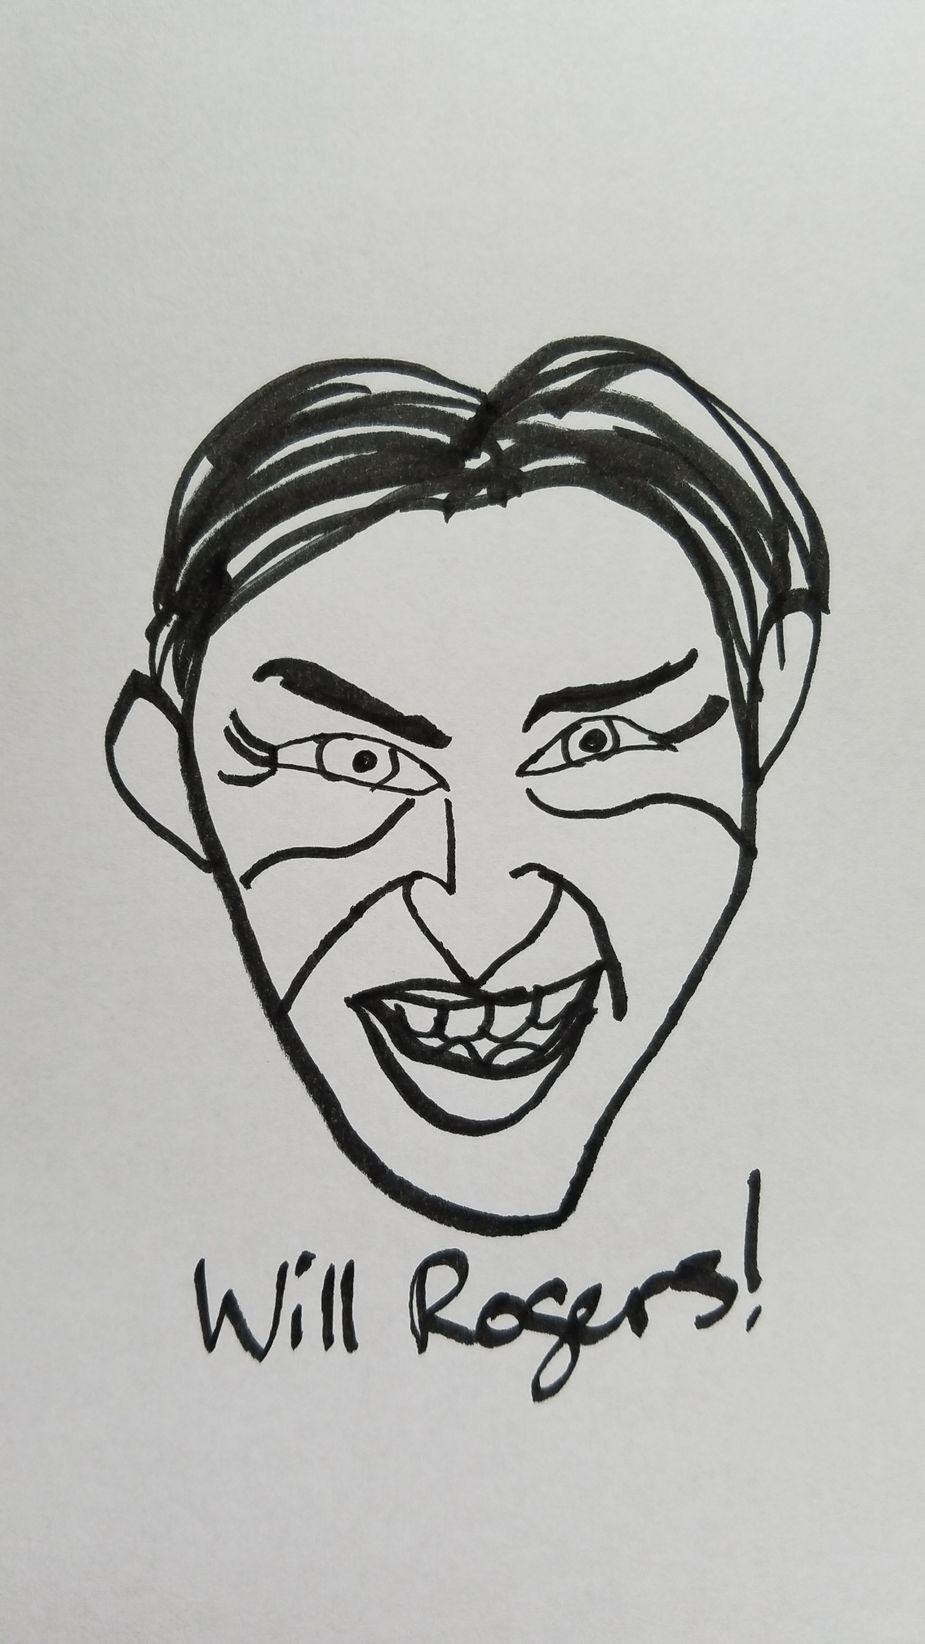 Will Rogers by Megan Rossman